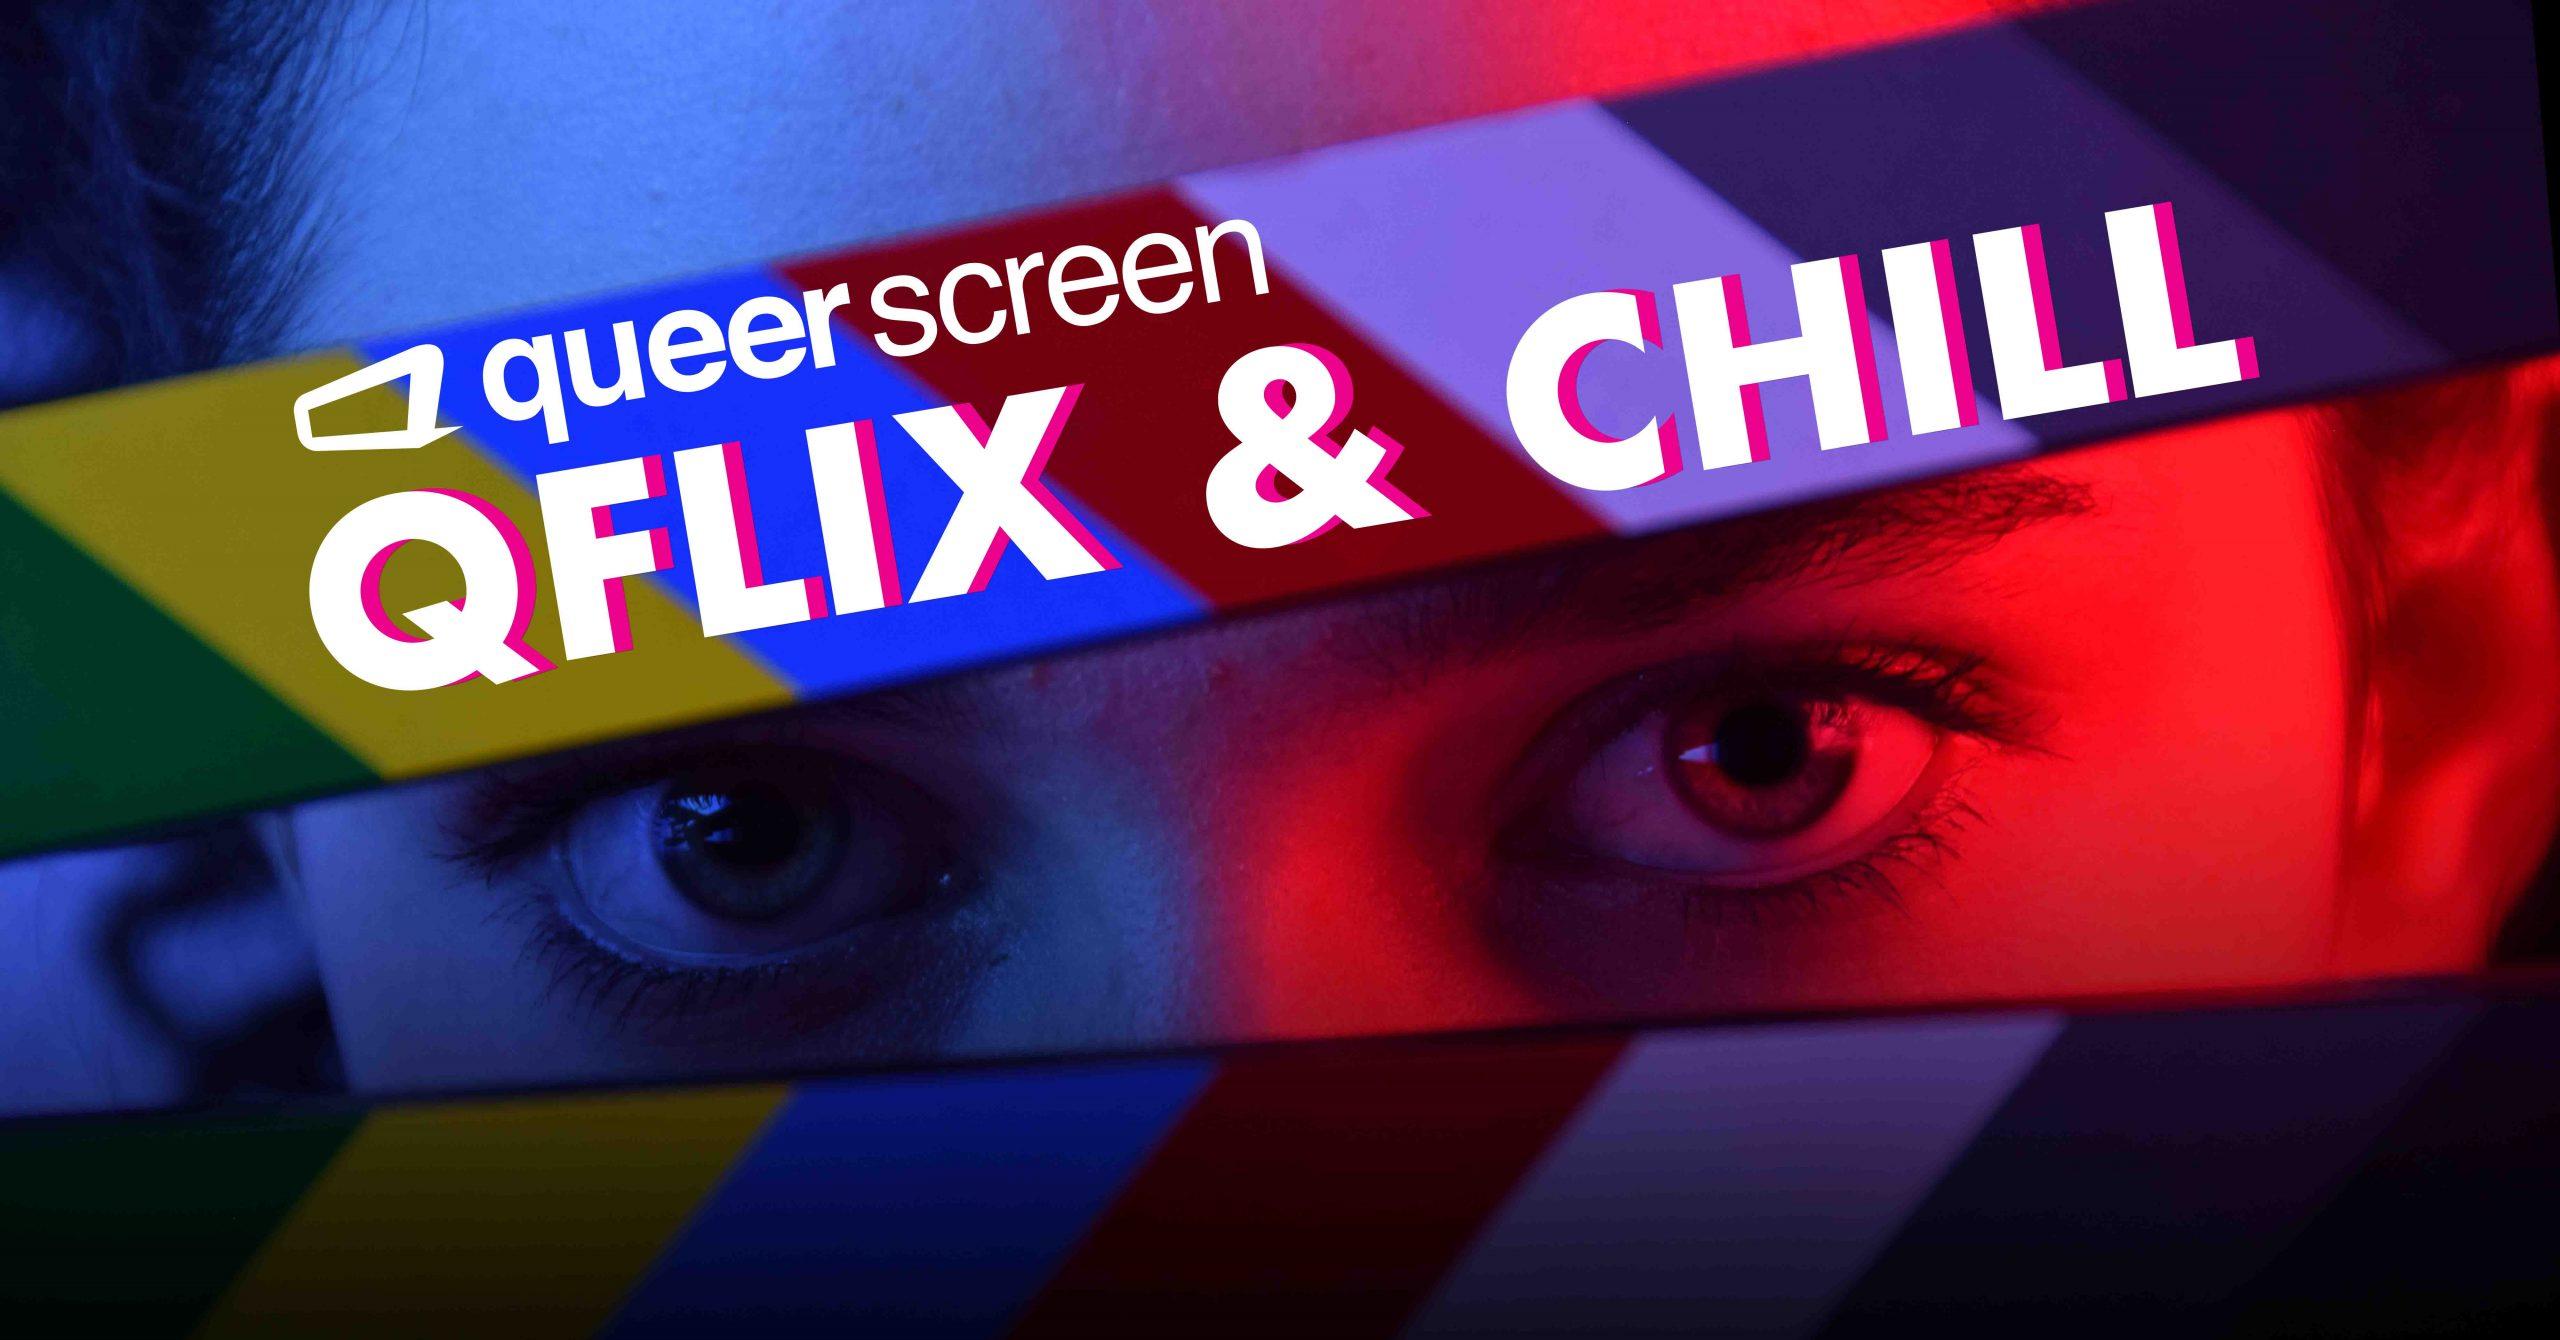 Queerscreen QFLIX AND CHILL Feb 2021 Website header